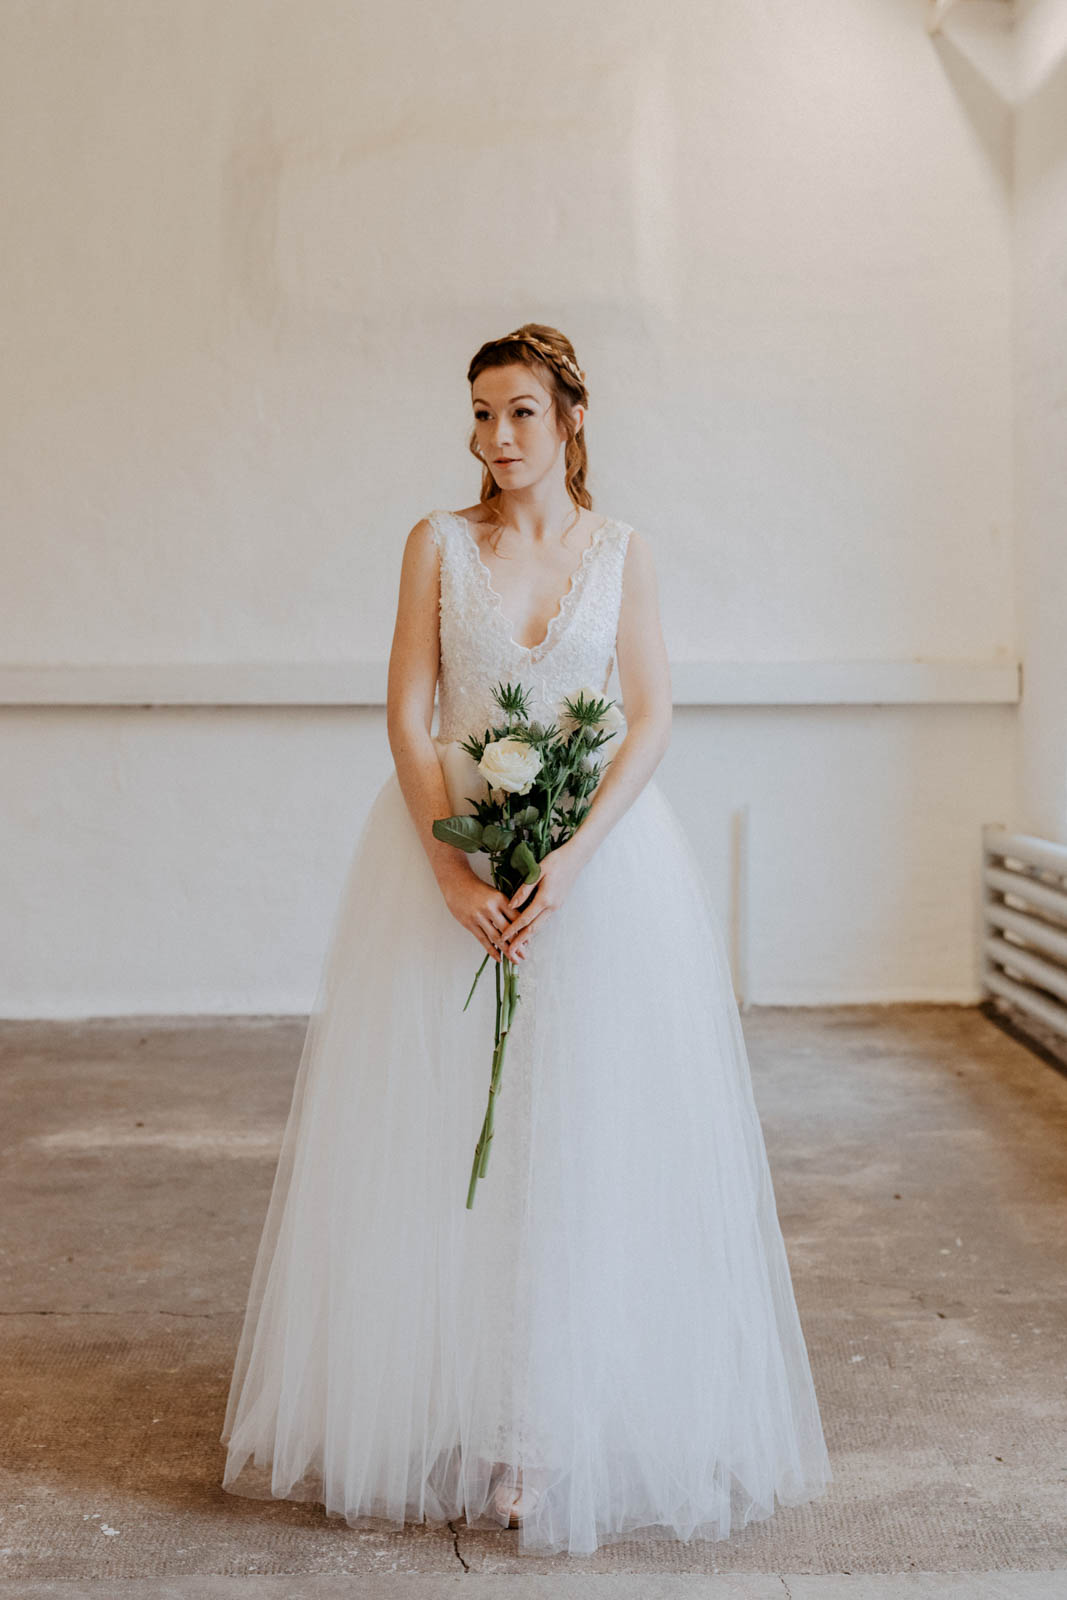 Brautkleid mit abnehmbaren Tüllrock